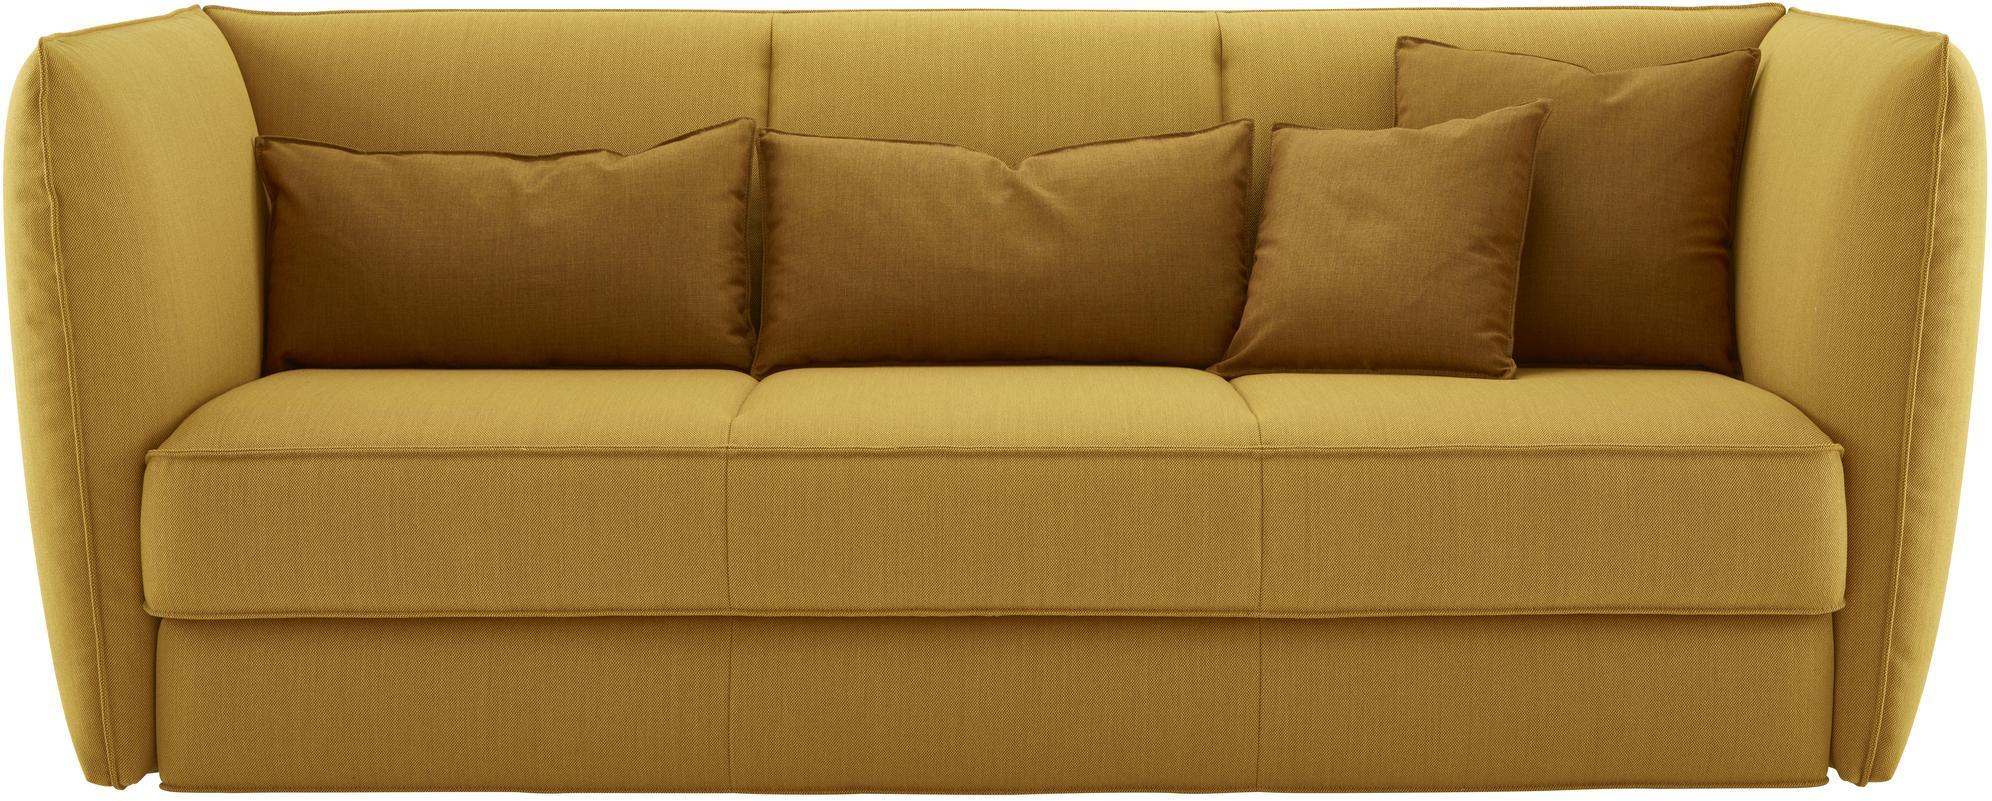 Softly sofa beds designer nick rennie ligne roset - Nomad sofa ligne roset ...